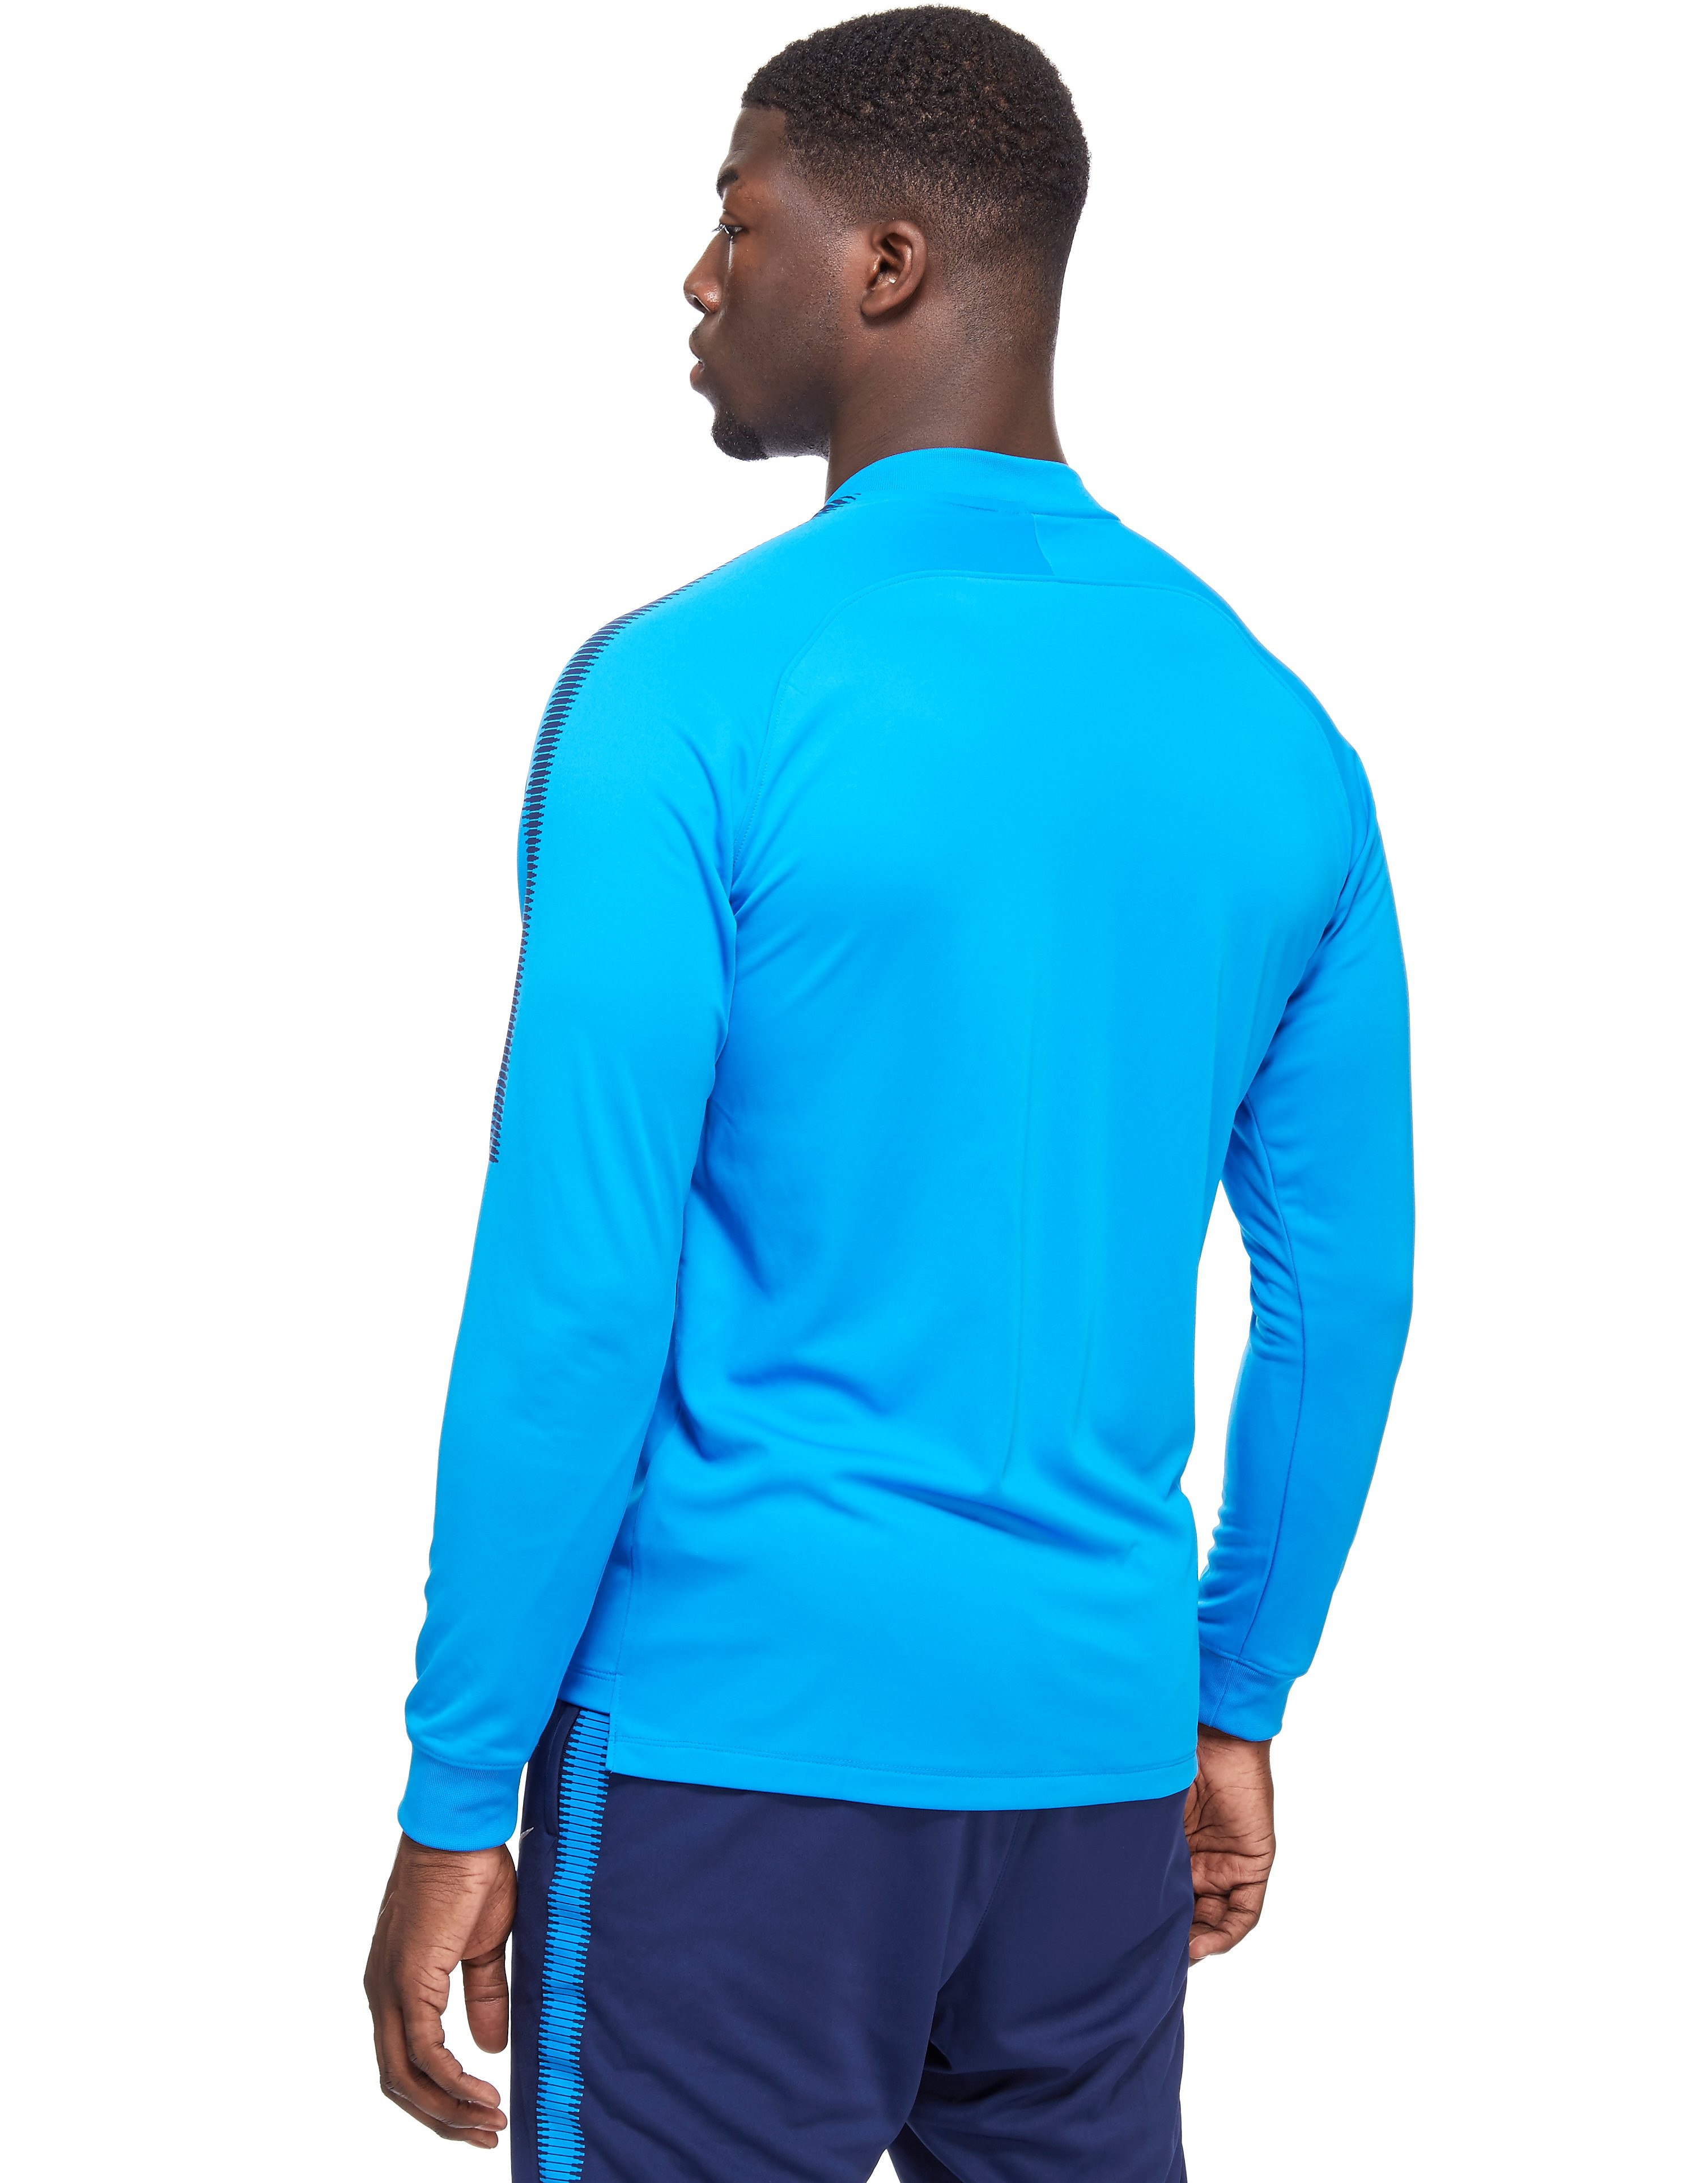 Nike chaqueta Tottenham Hotspur 2017 Squad